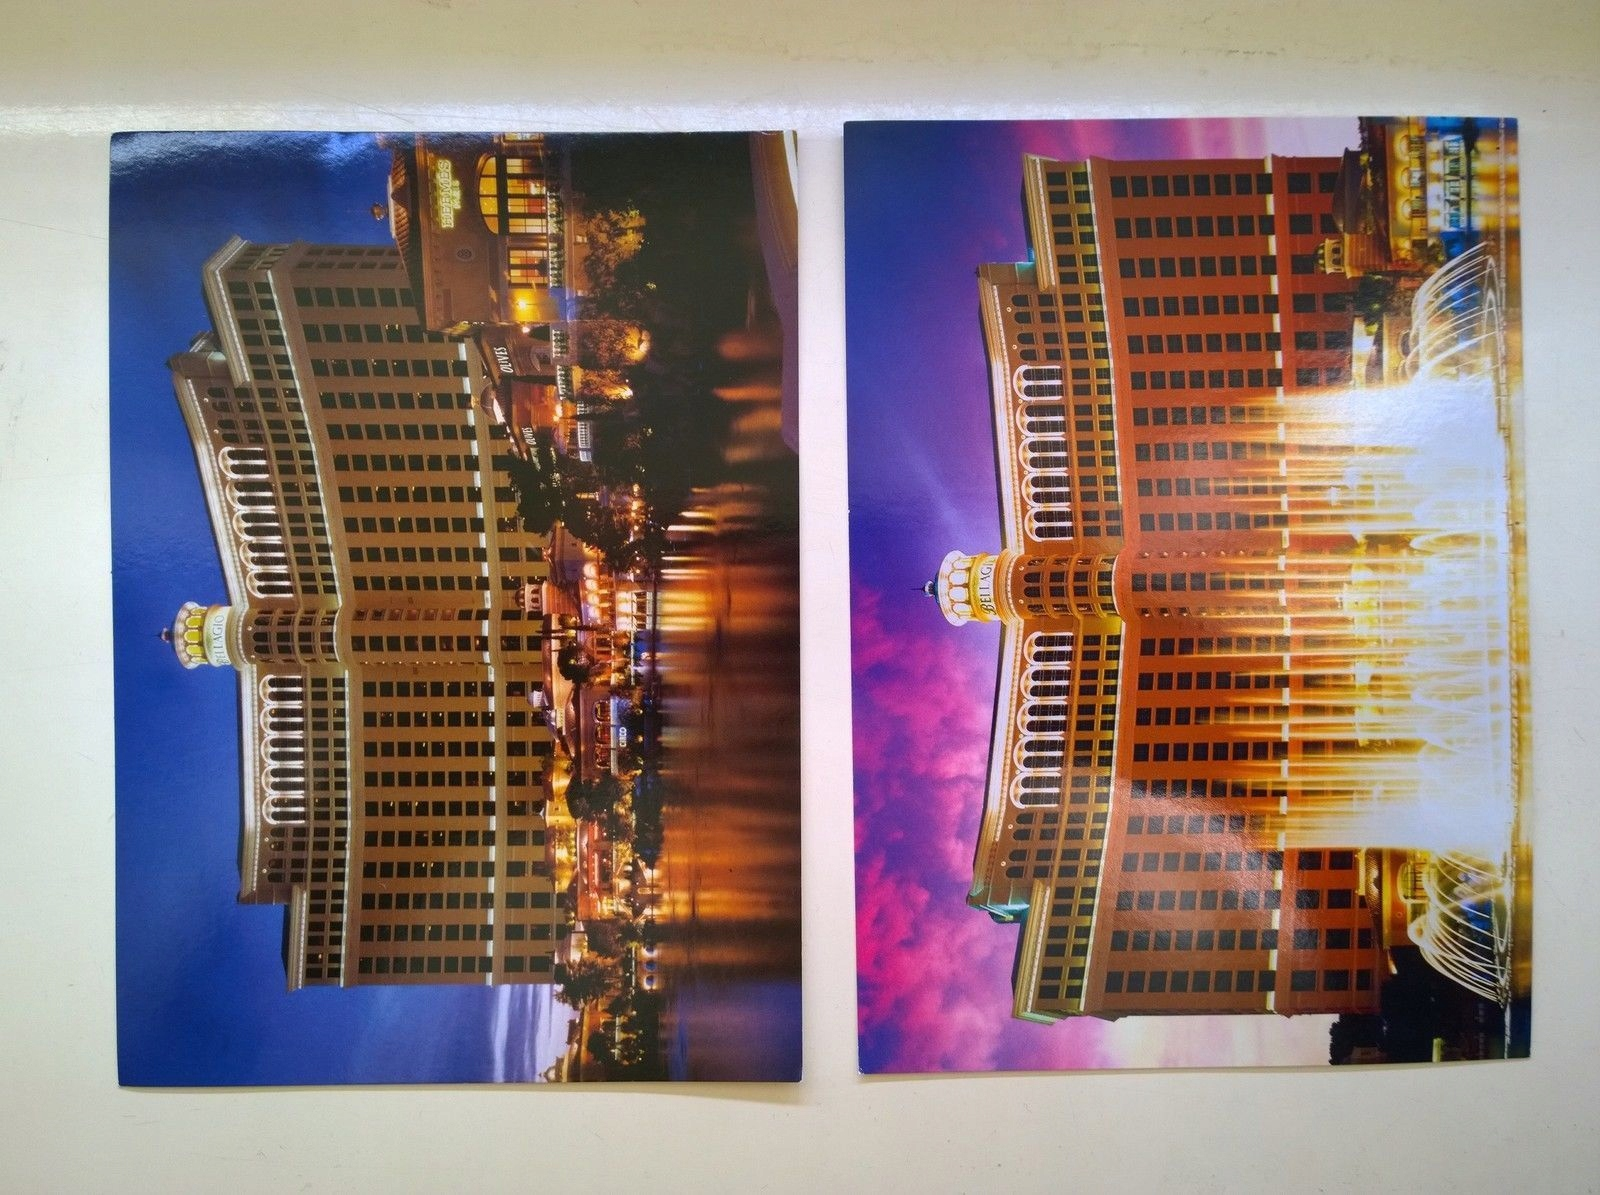 Kartki Bellagio Hotel & Casino Las Vegas